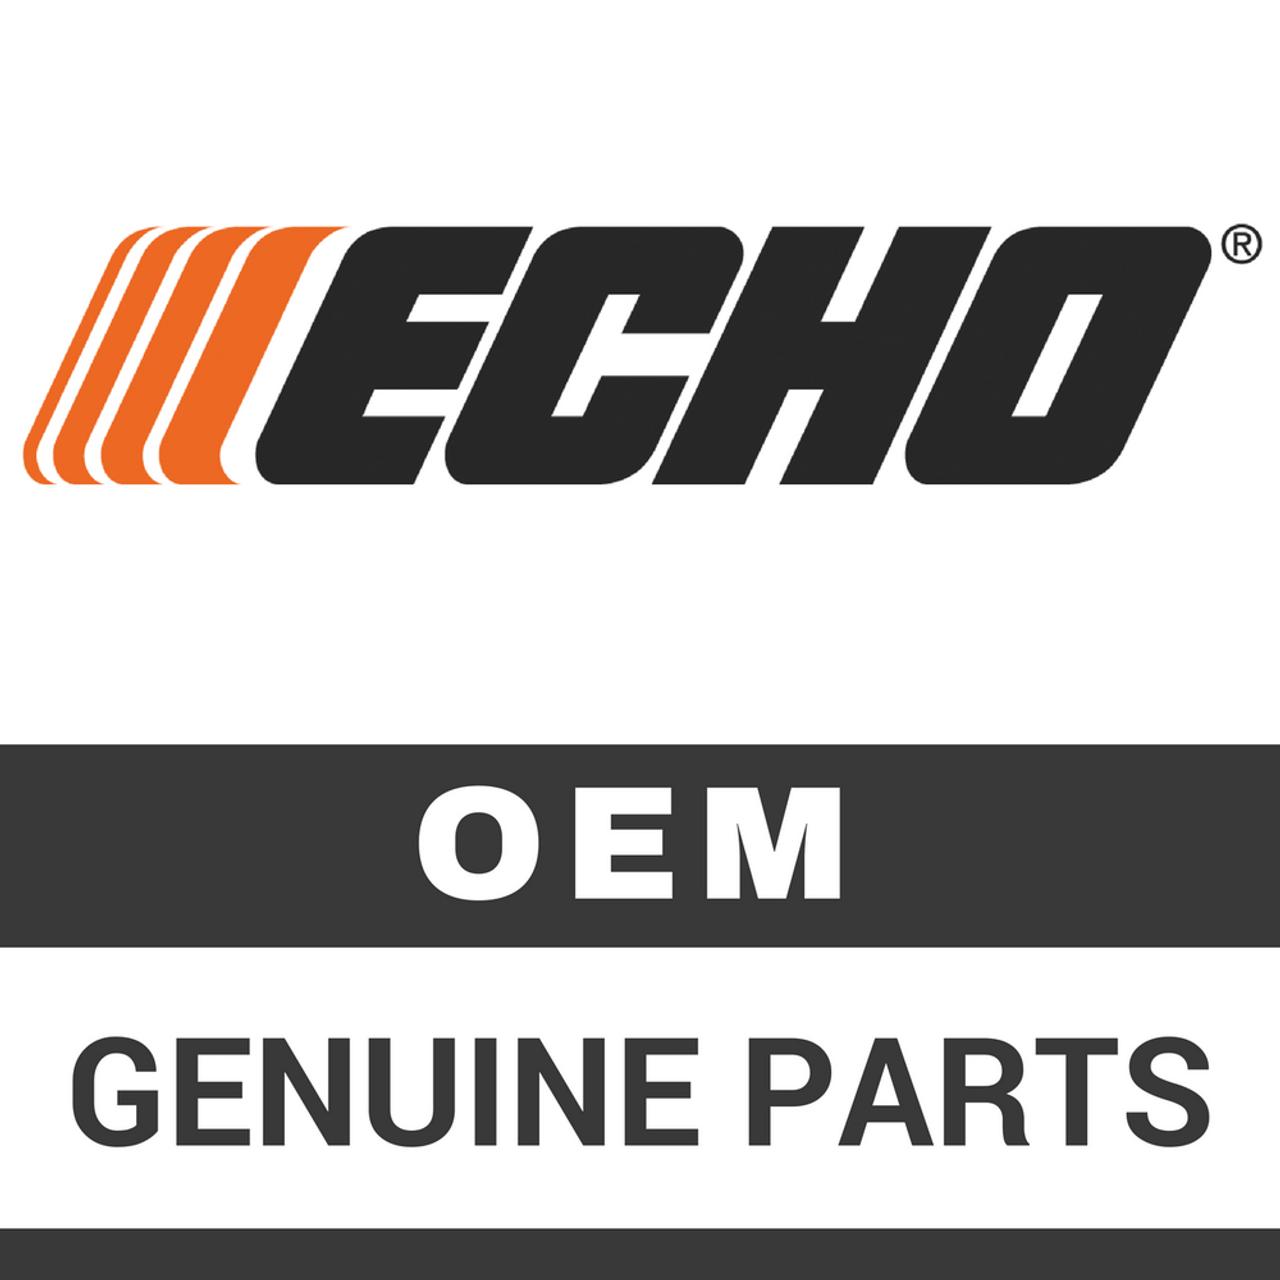 Genuine echo Part PLATE MUFFLER GASKET A301000020